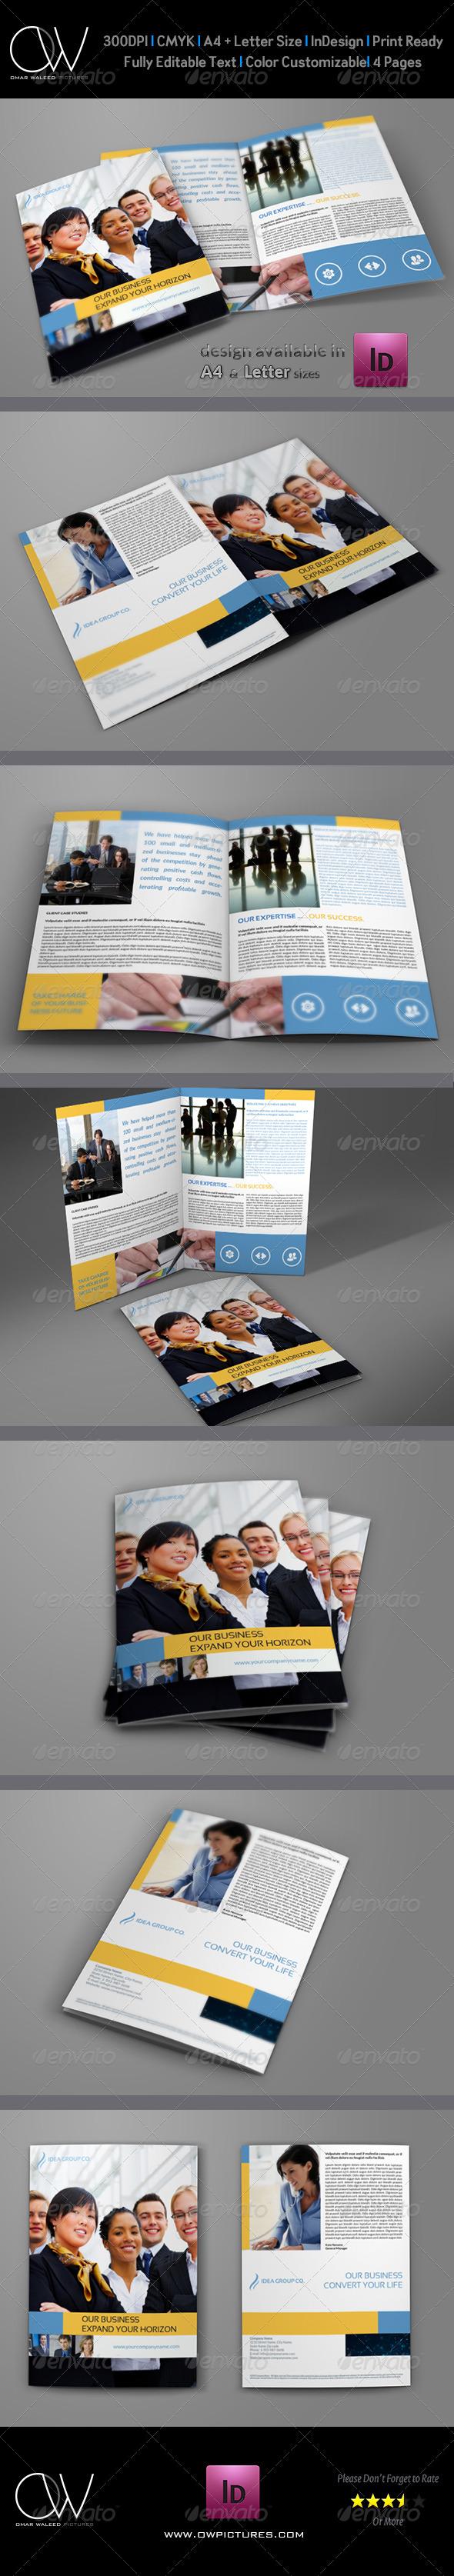 Company Brochure Bi-Fold Template Vol.11 - Corporate Brochures